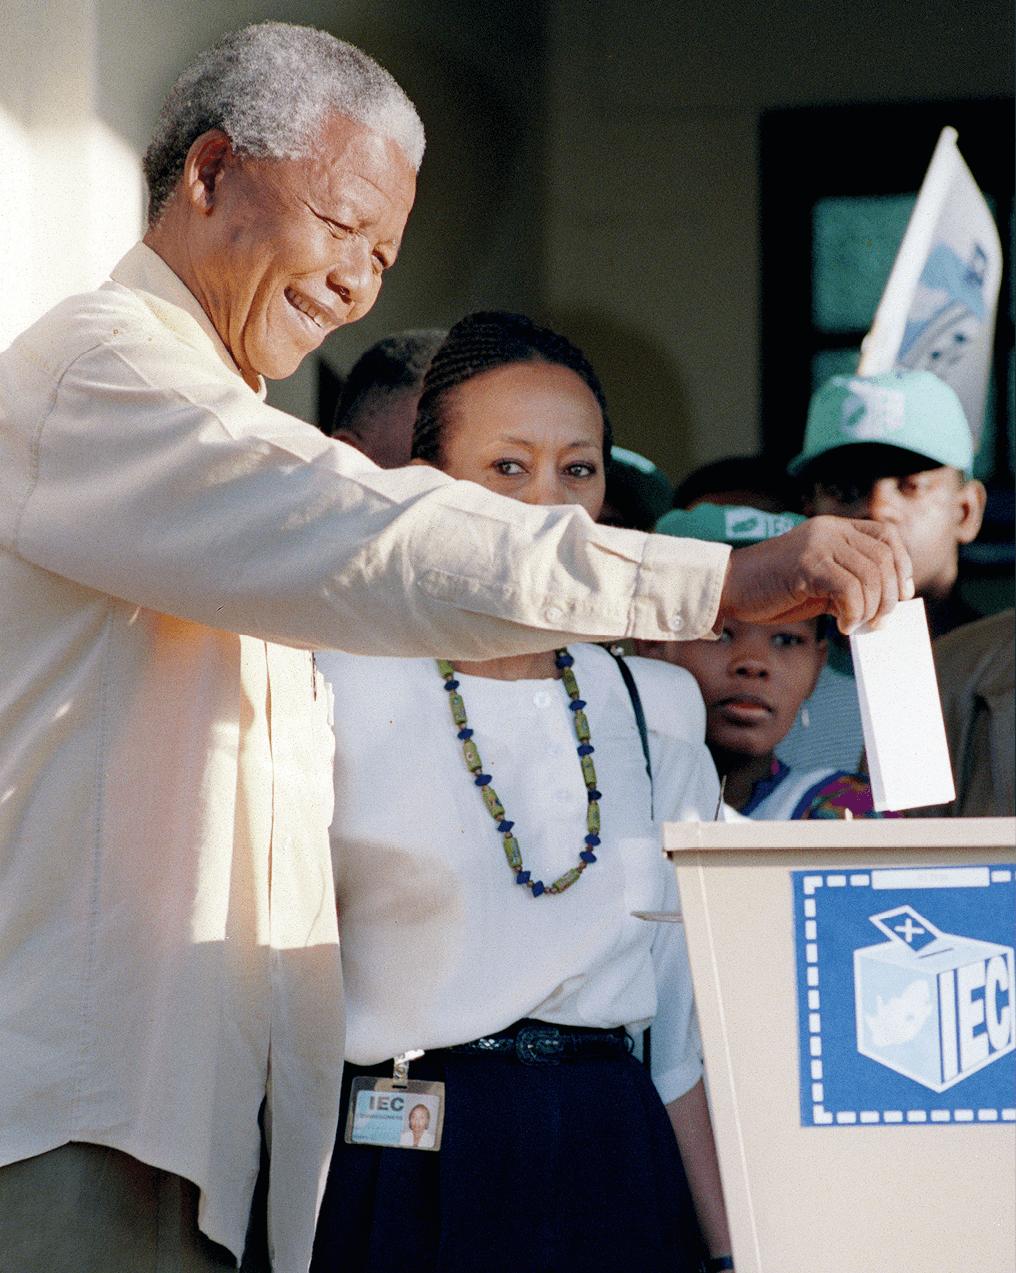 Walter Dhladhla, 1994, photographie de Nelson Mandela qui vote